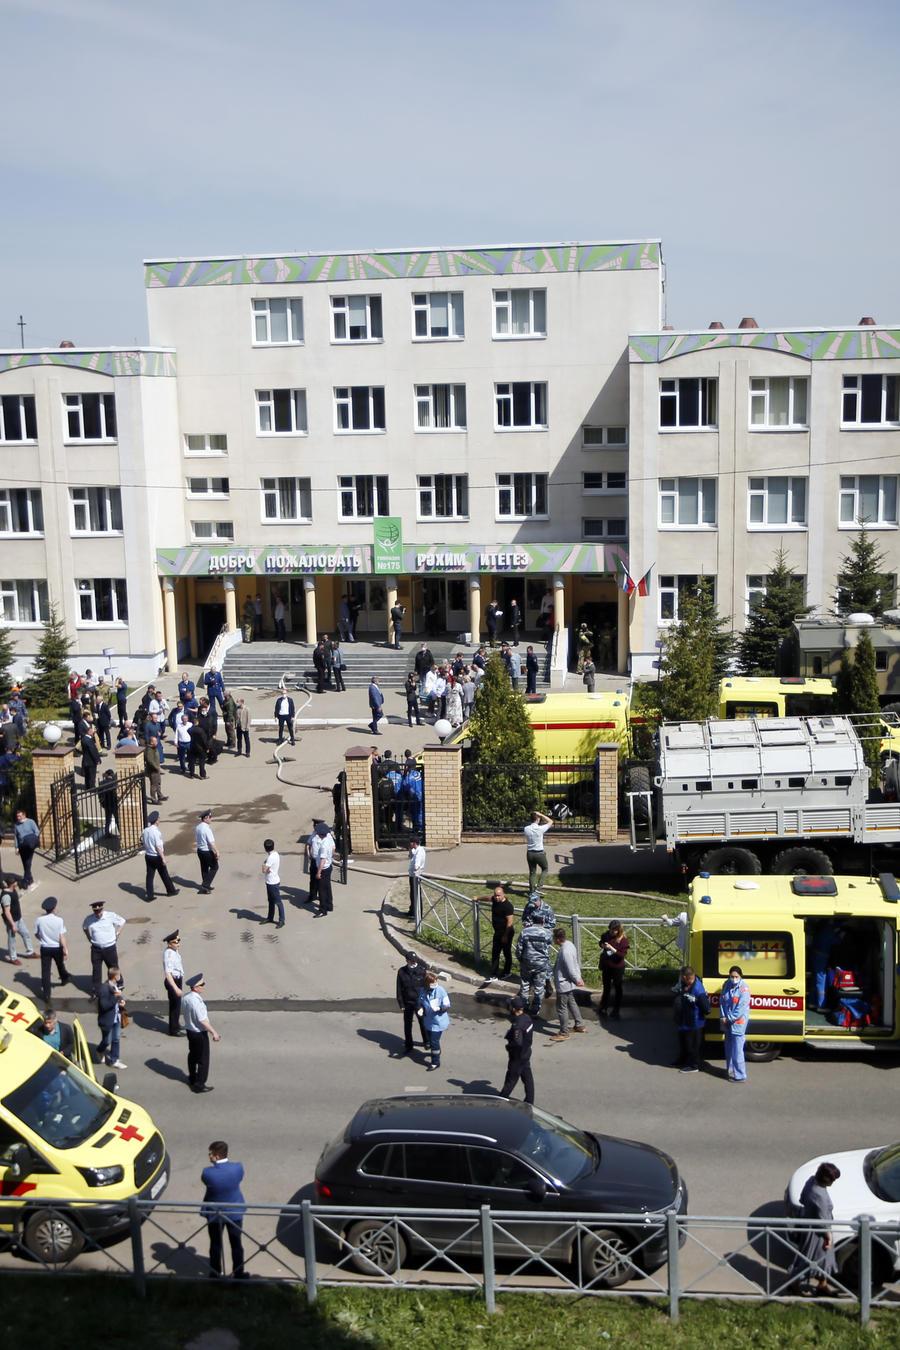 Balacera en una escuela en Kazán, Rusia